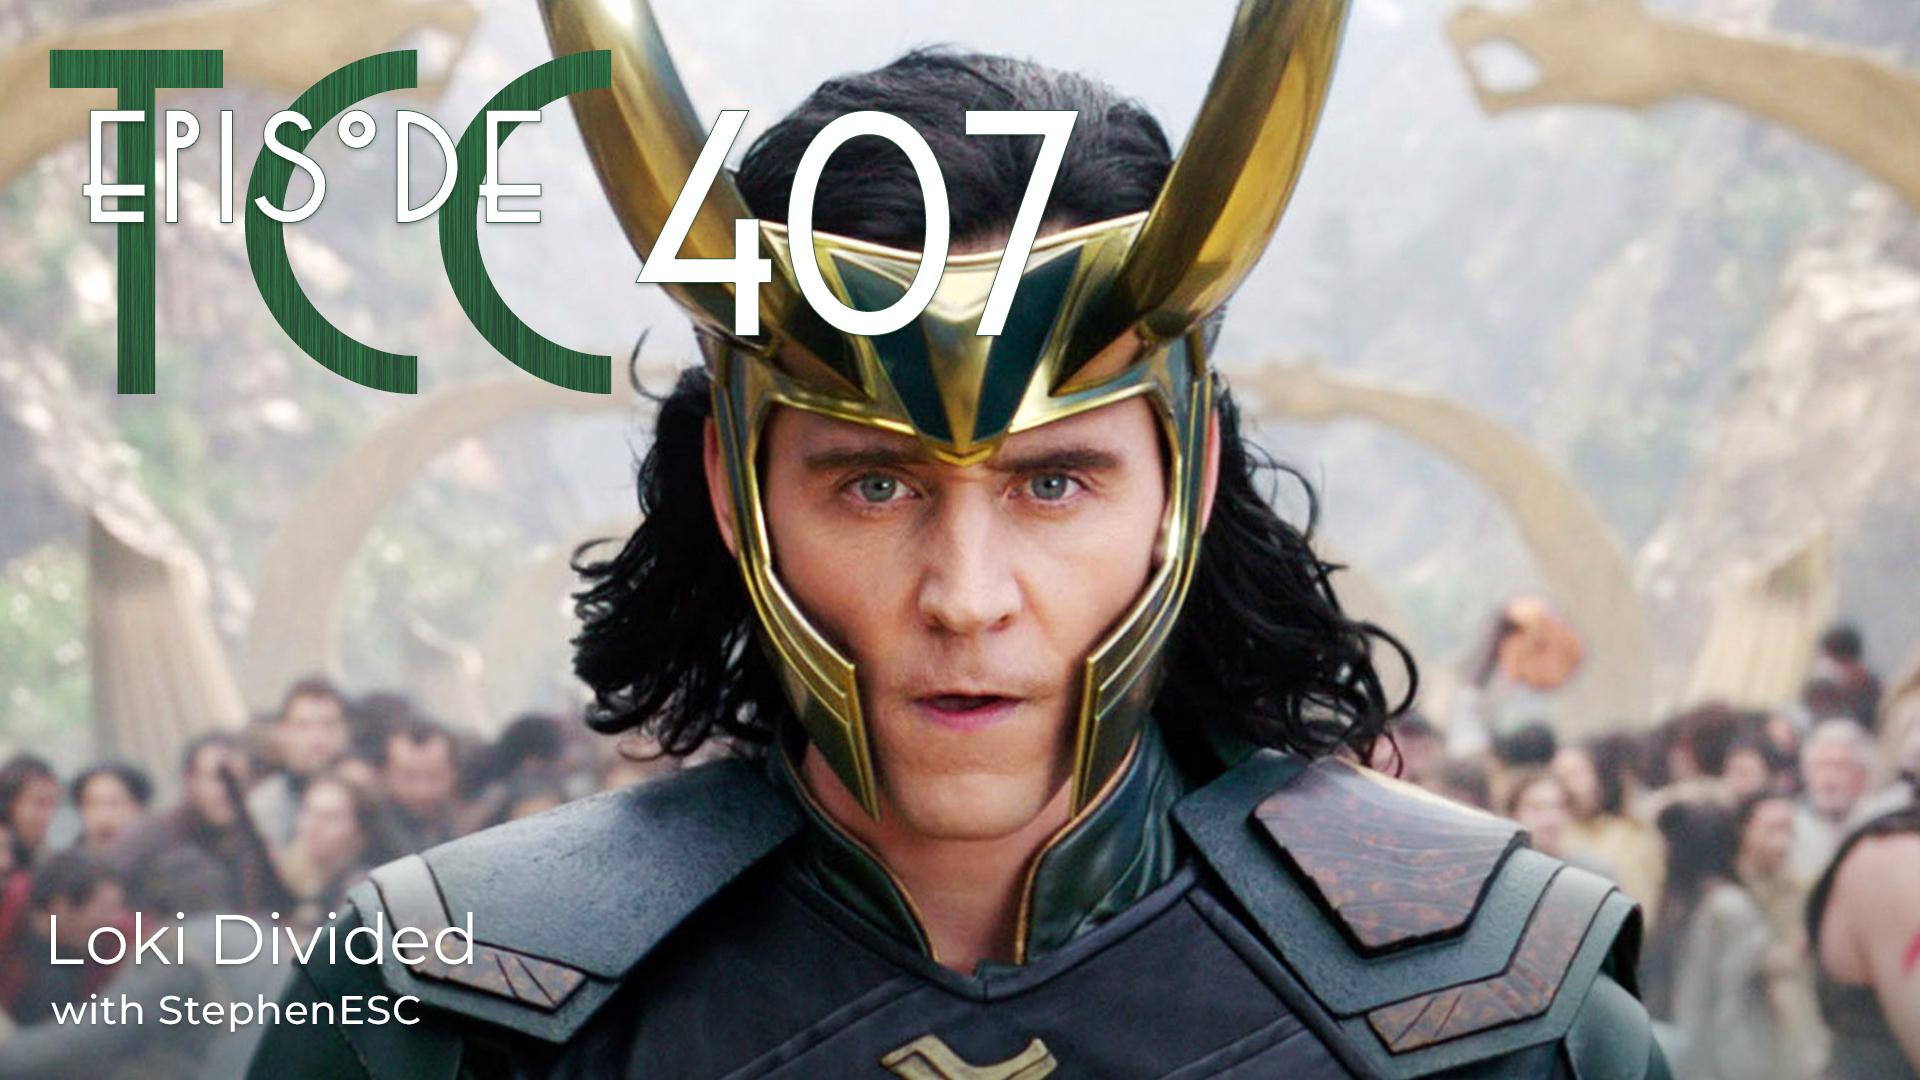 The Citadel Cafe 407: Loki Divided